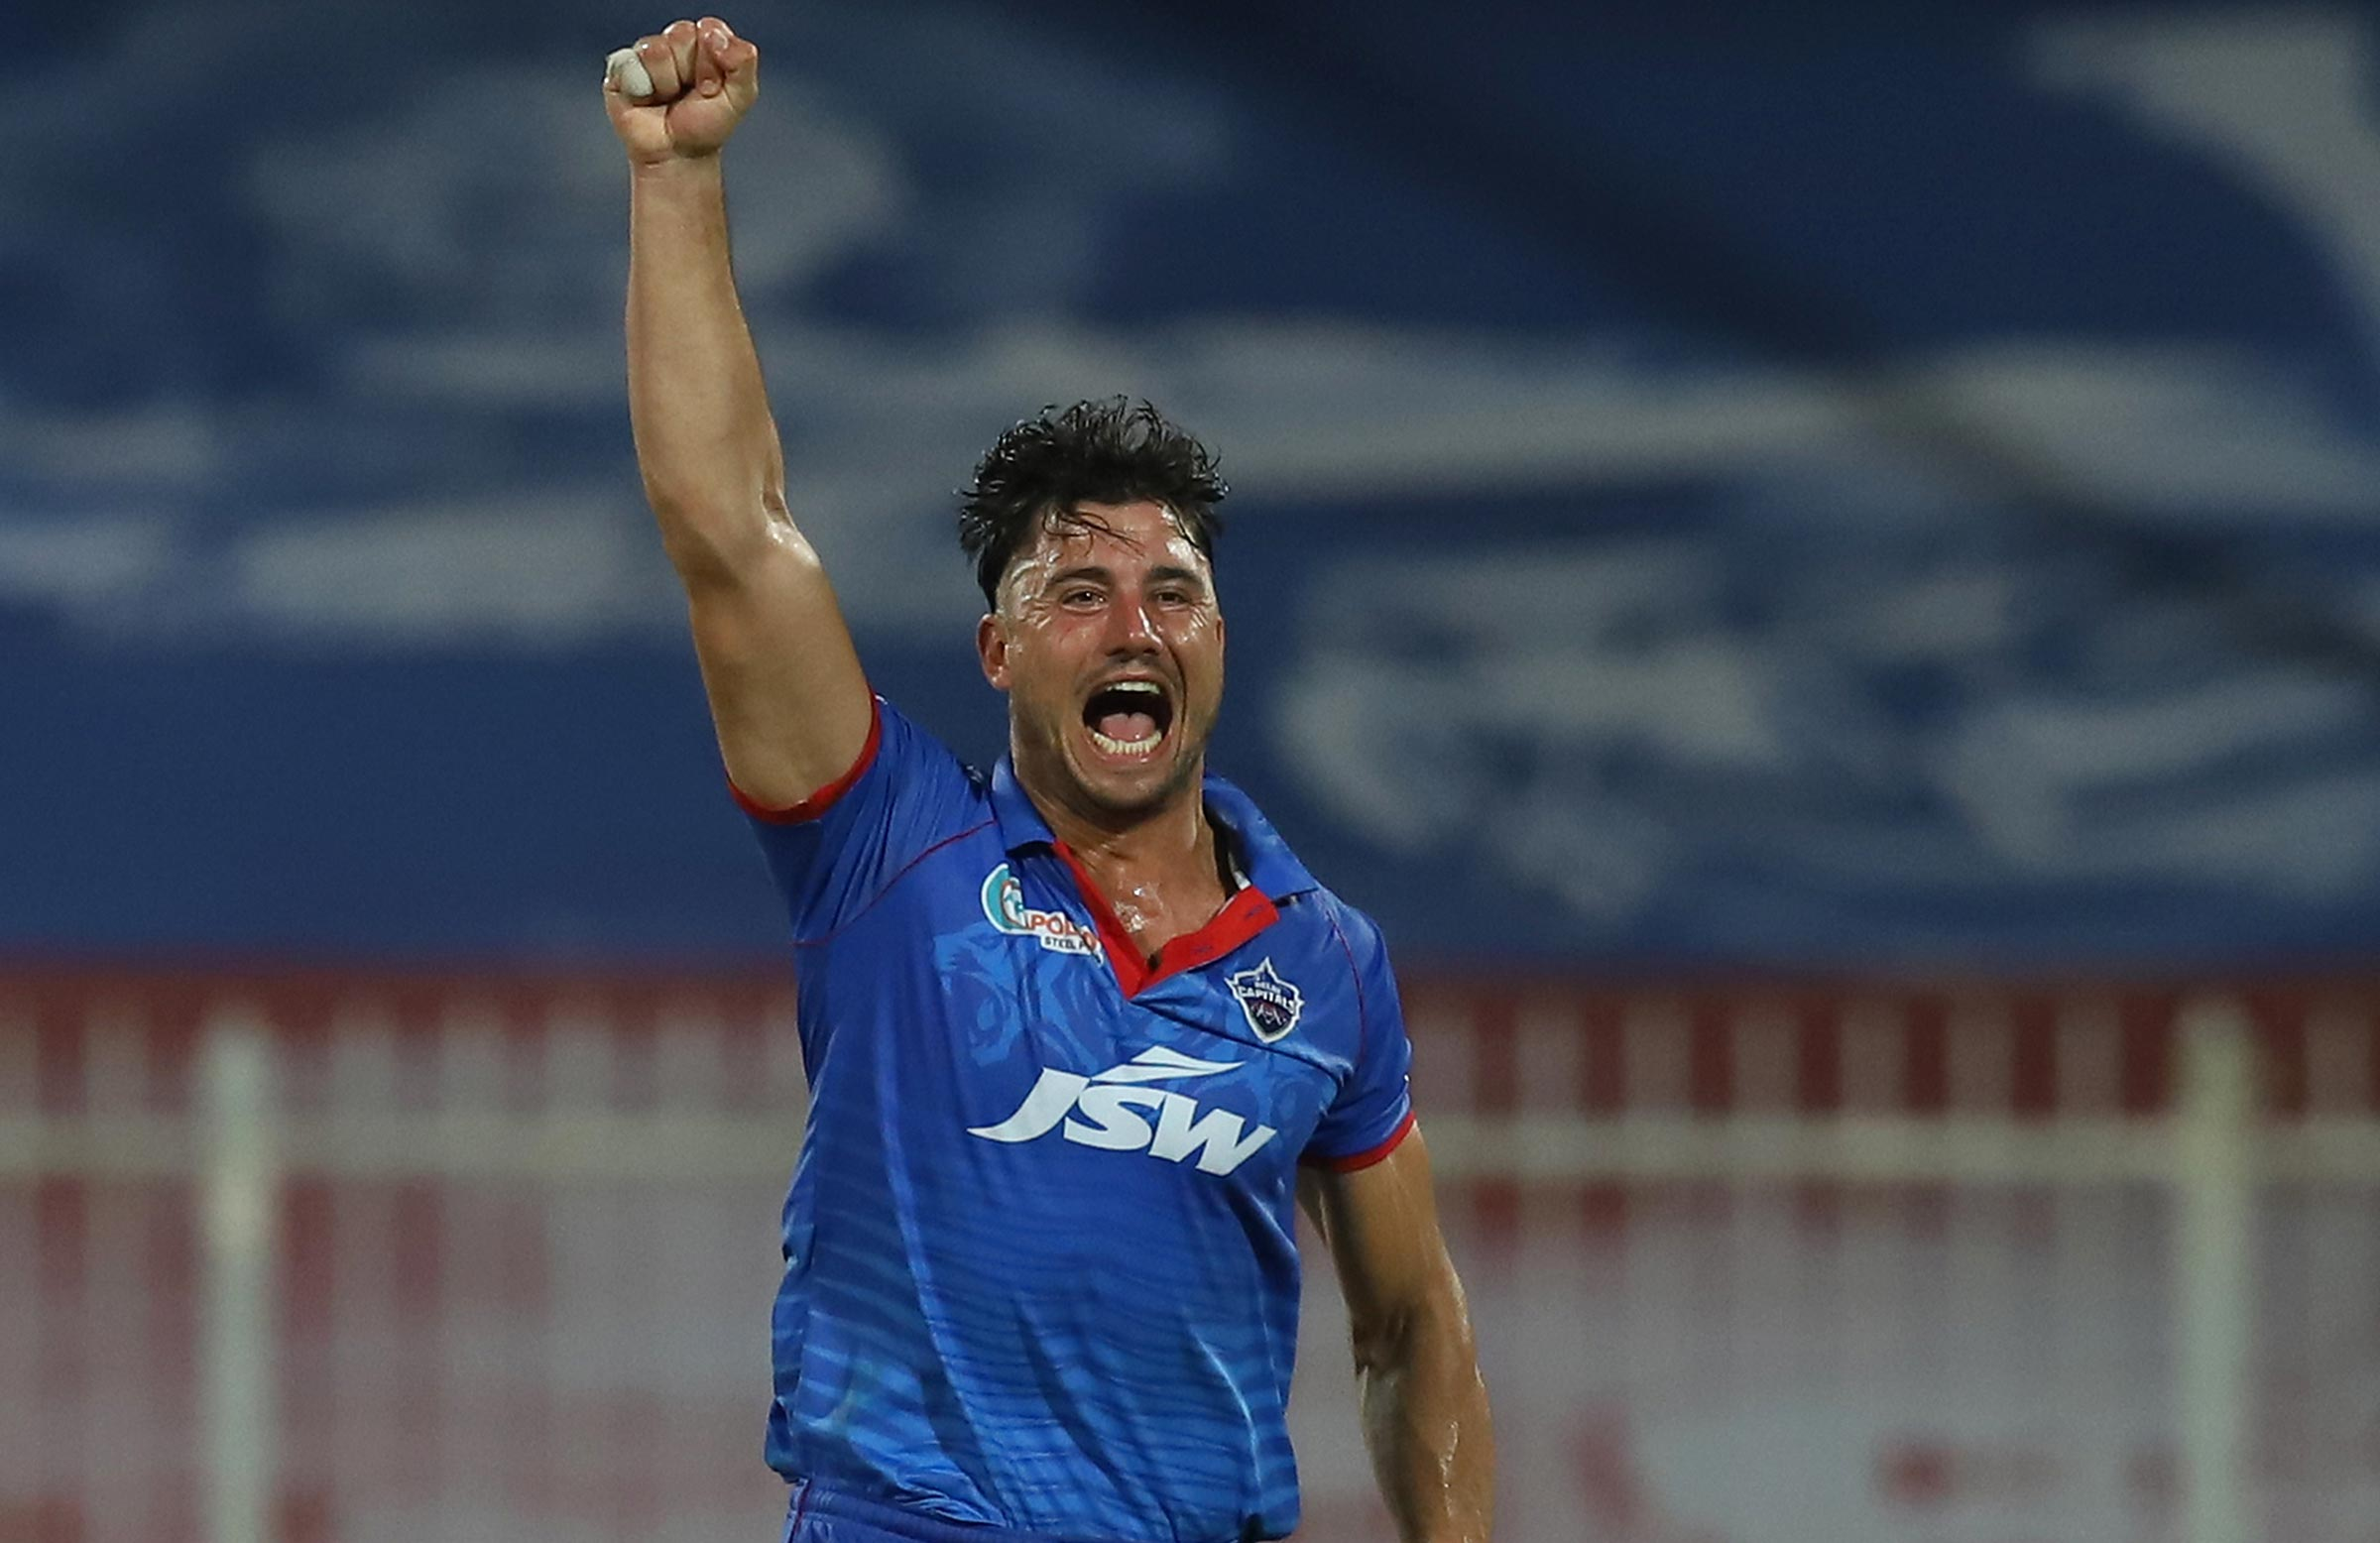 Stoinis will return to Delhi this season // BCCI-Sportzpics